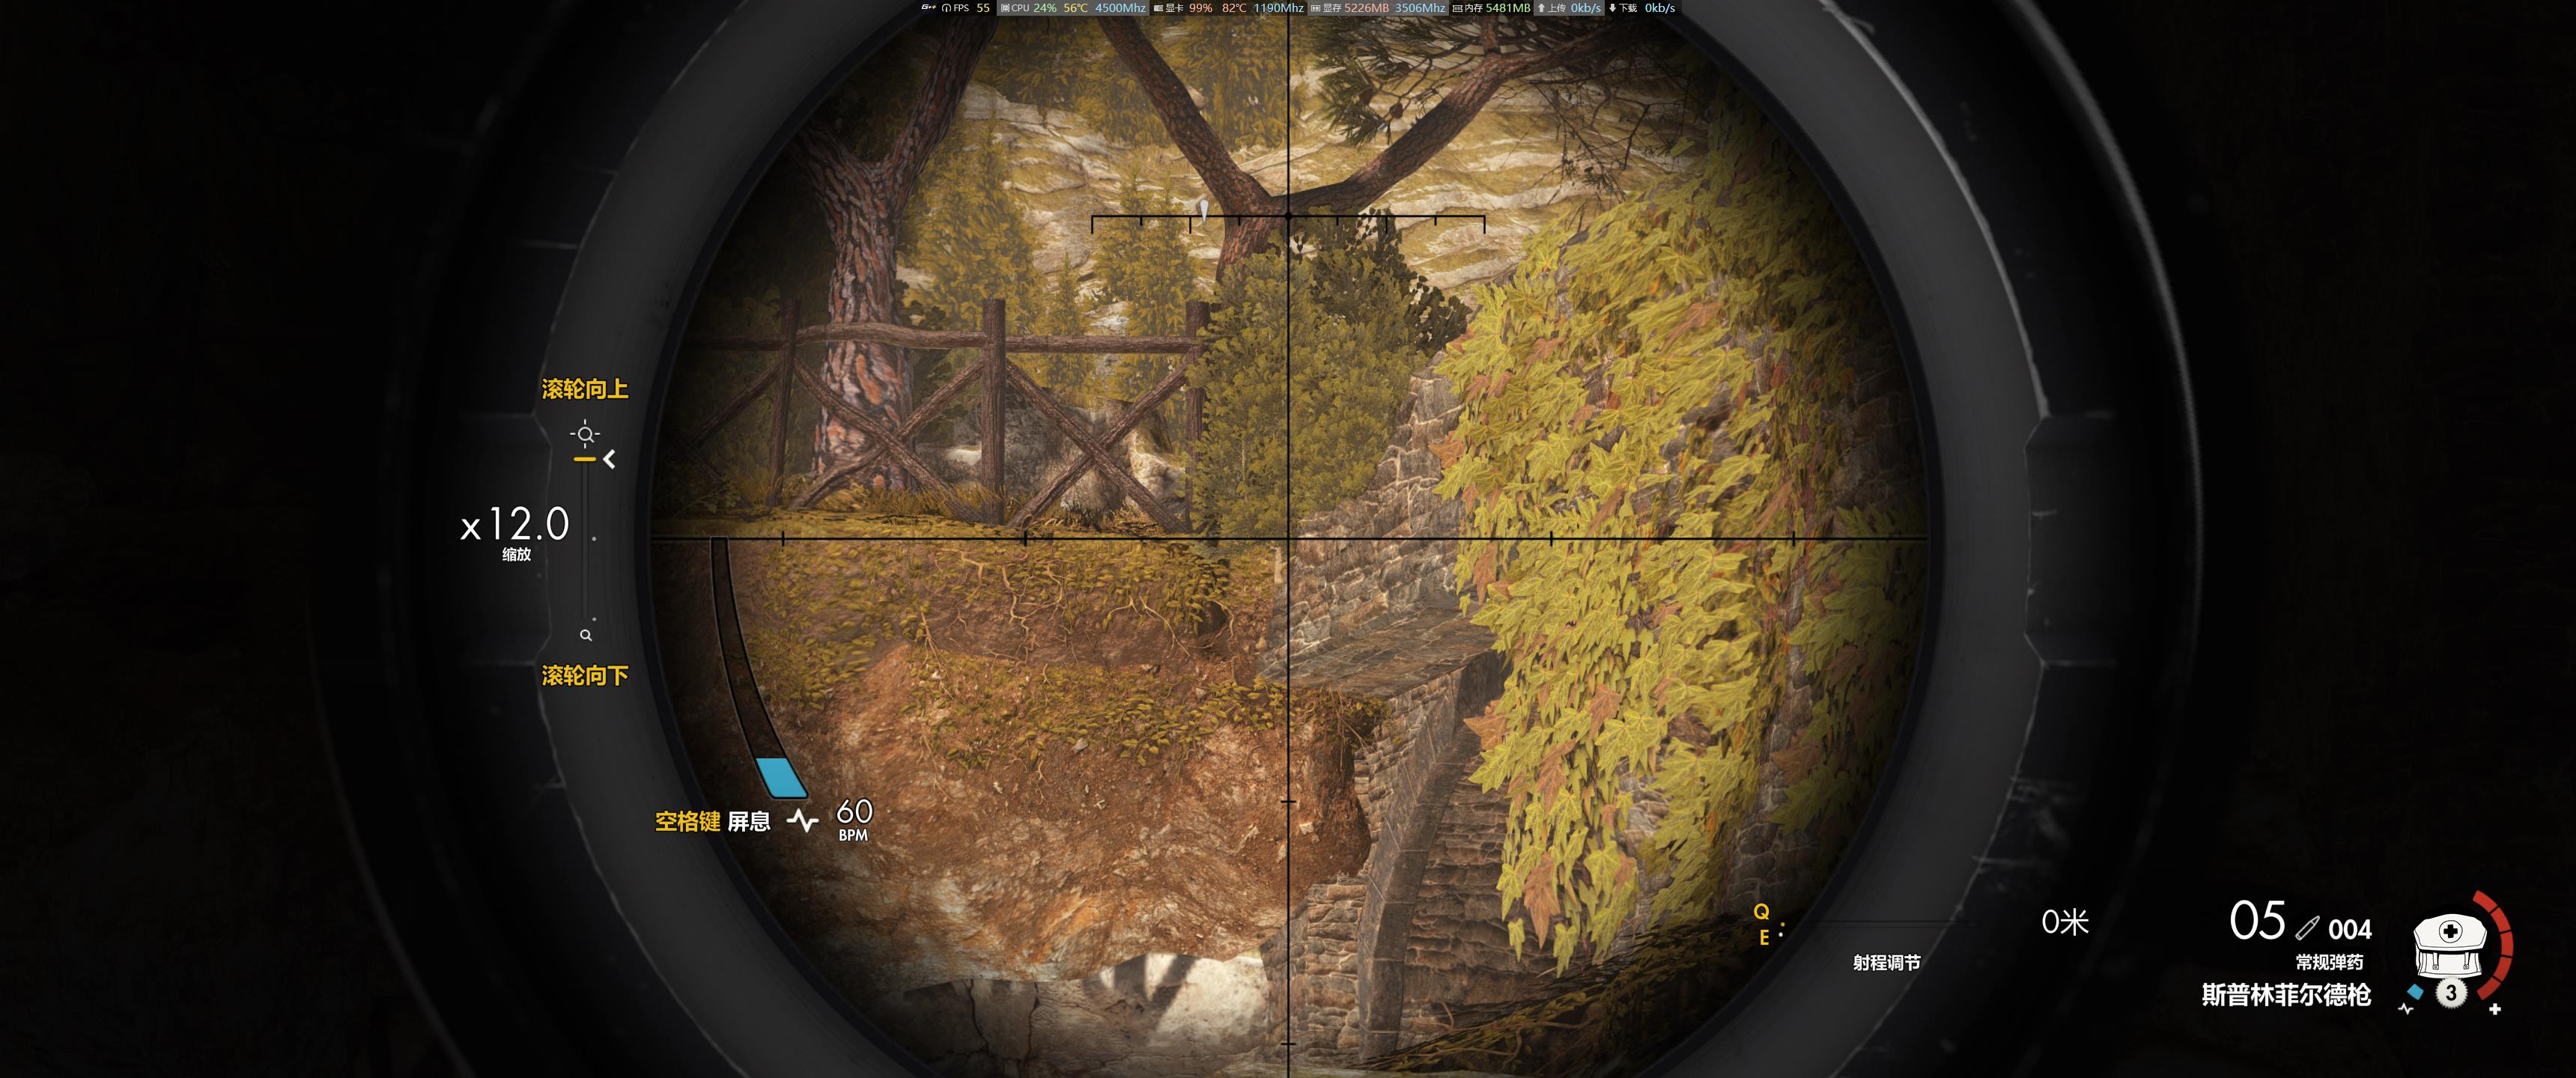 SniperElite4_DX11-25-12-47-54.jpg